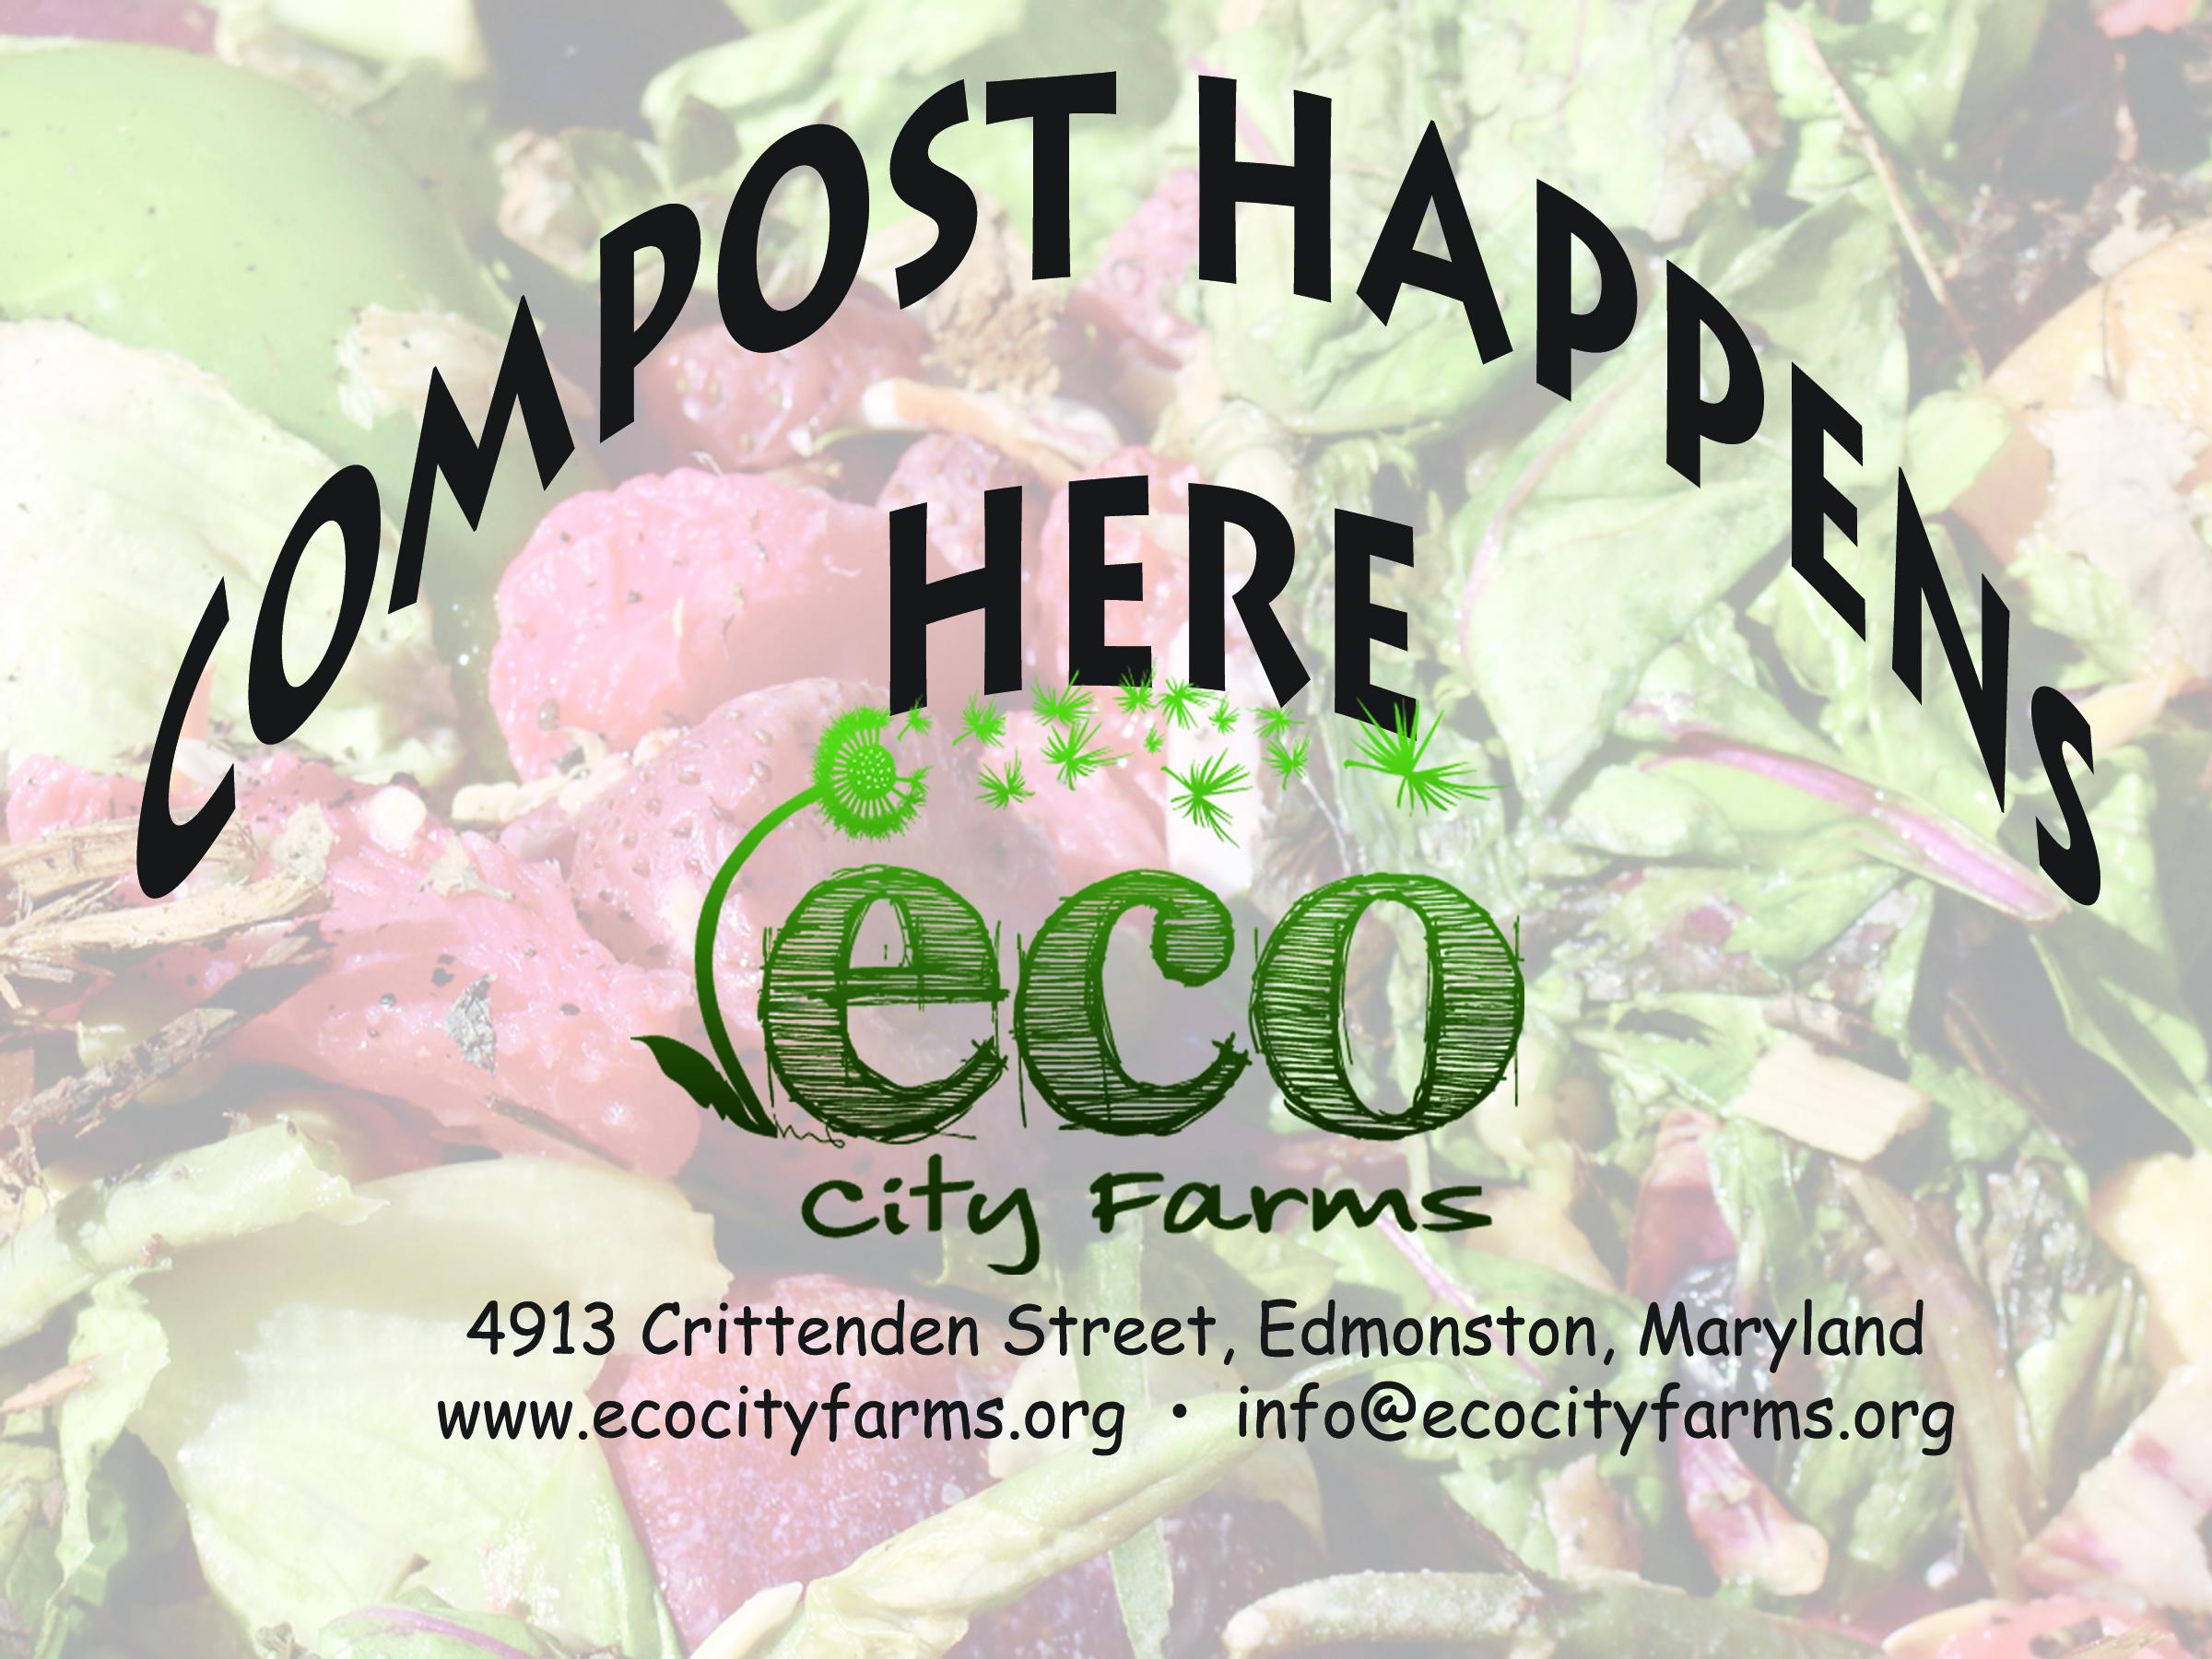 Compostposter